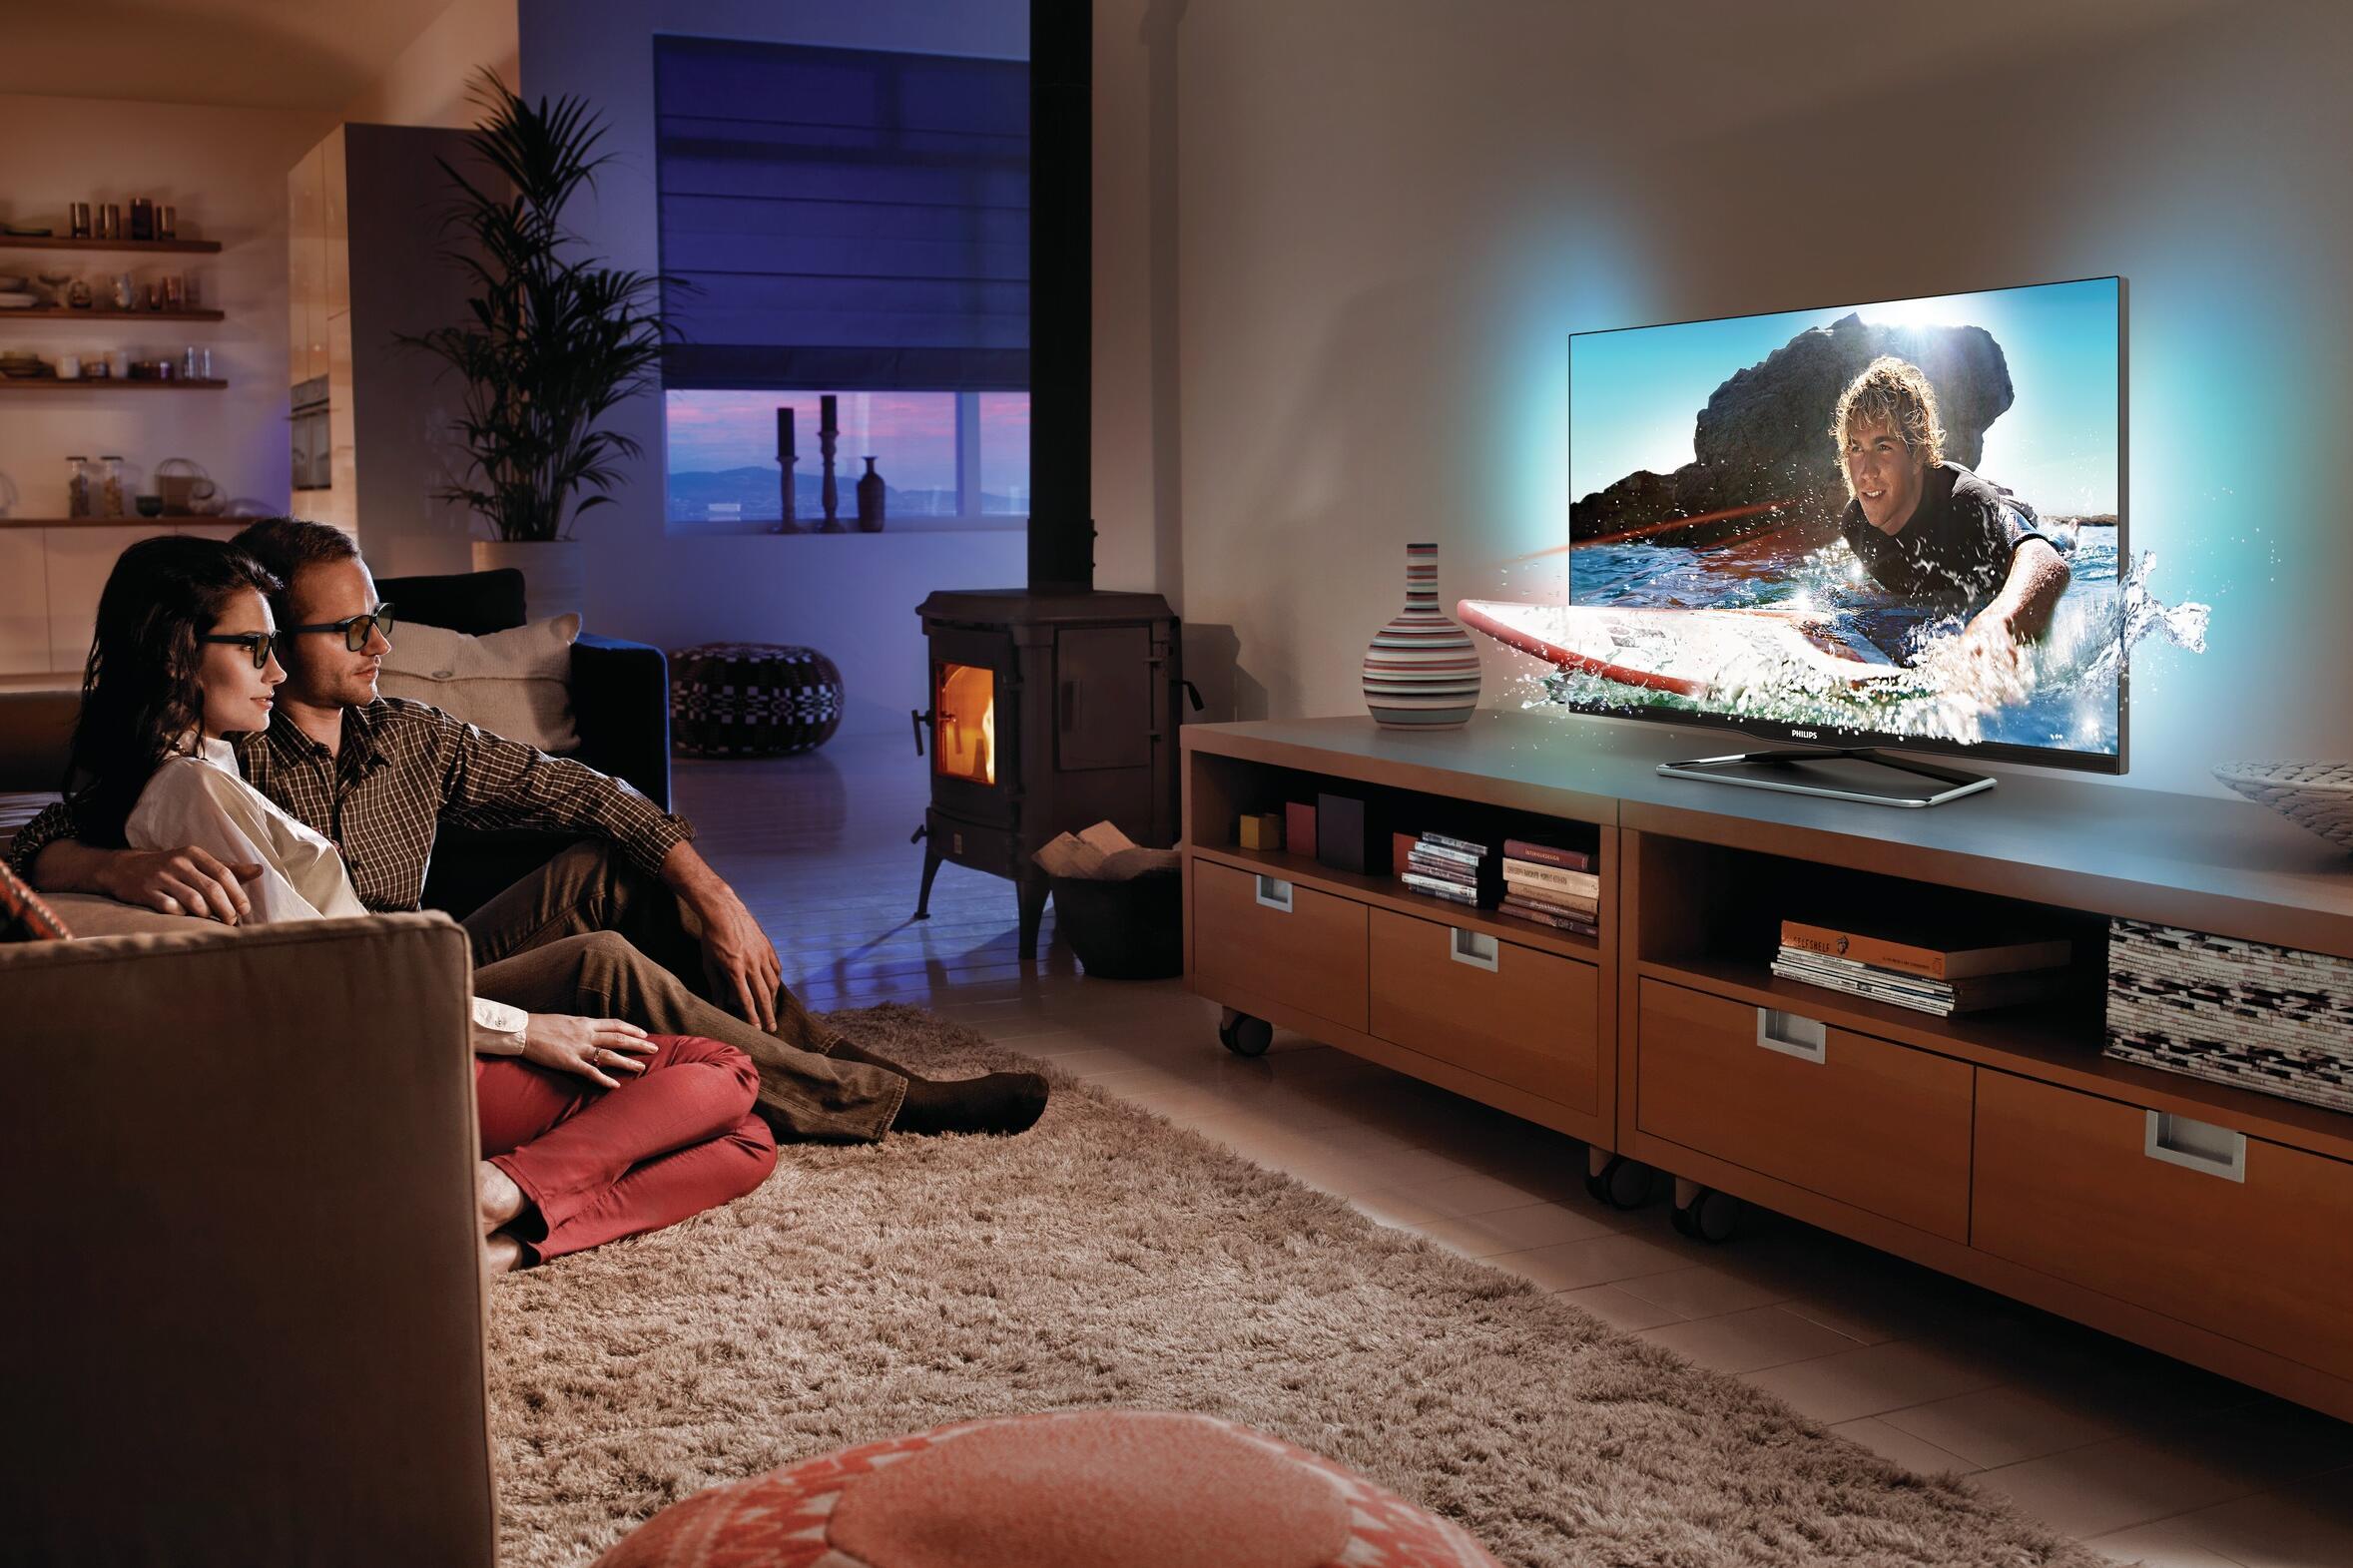 ifa trends was die neuen web tvs k nnen it internet technik handelsblatt. Black Bedroom Furniture Sets. Home Design Ideas